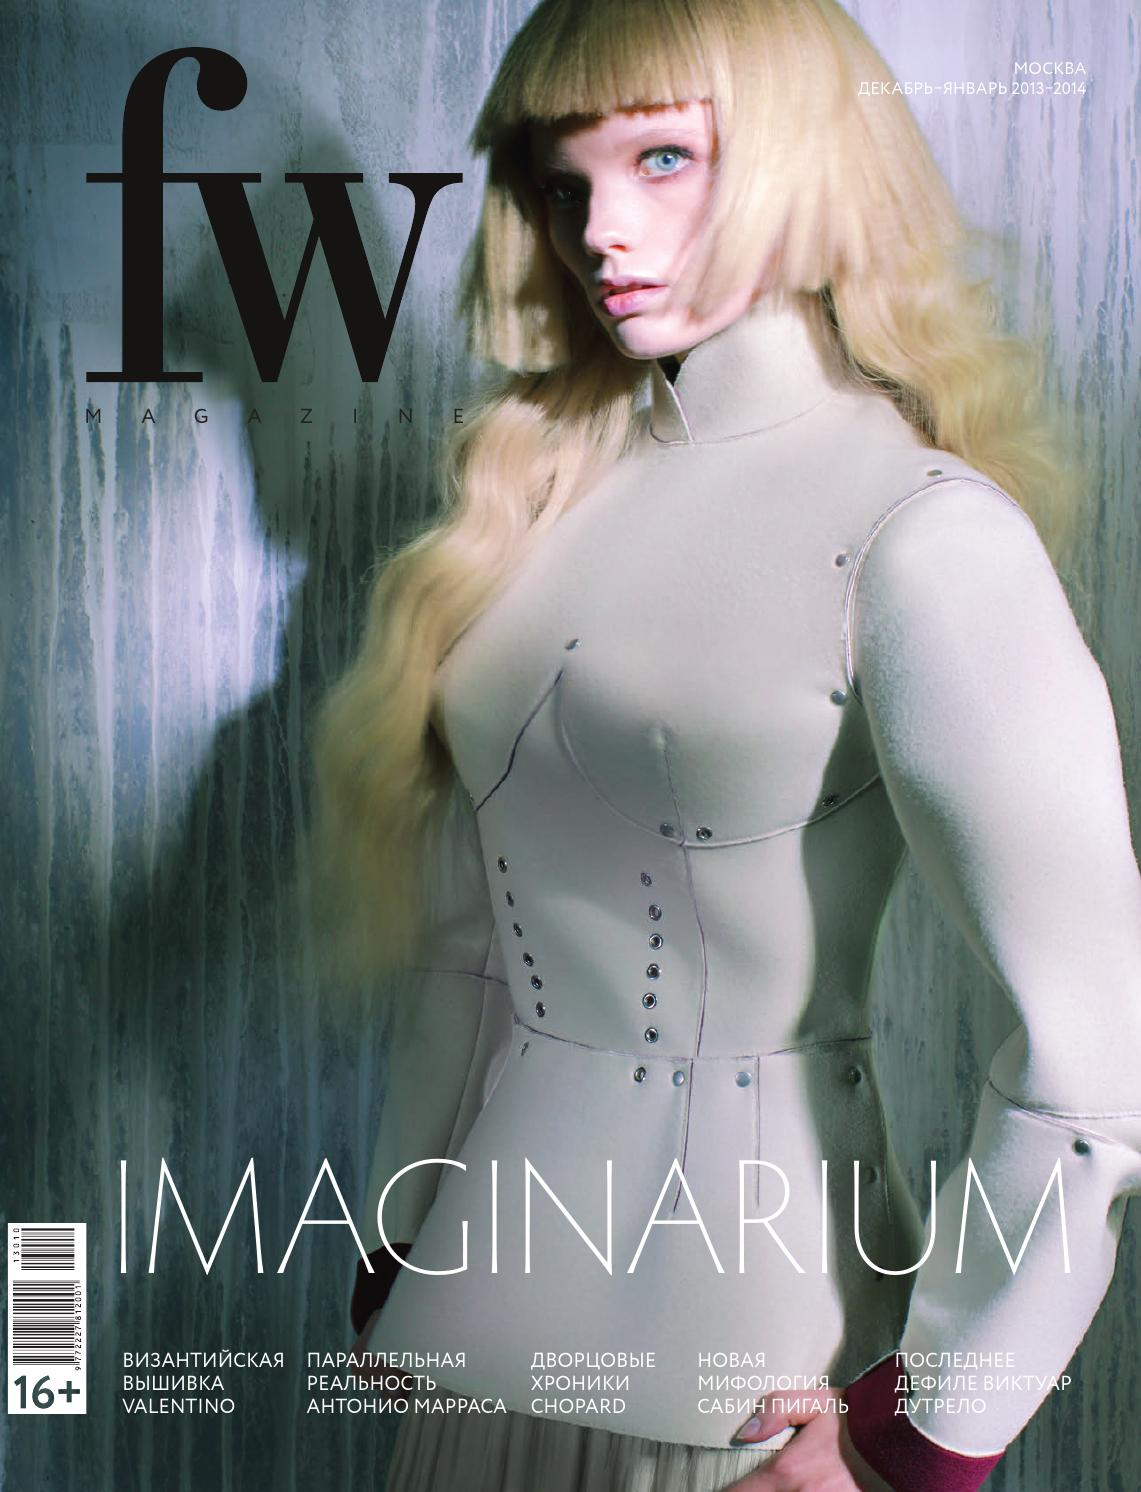 FW Magazine Moscow   December-January 2013-14 by FW Magazine - issuu a67ac89c9df